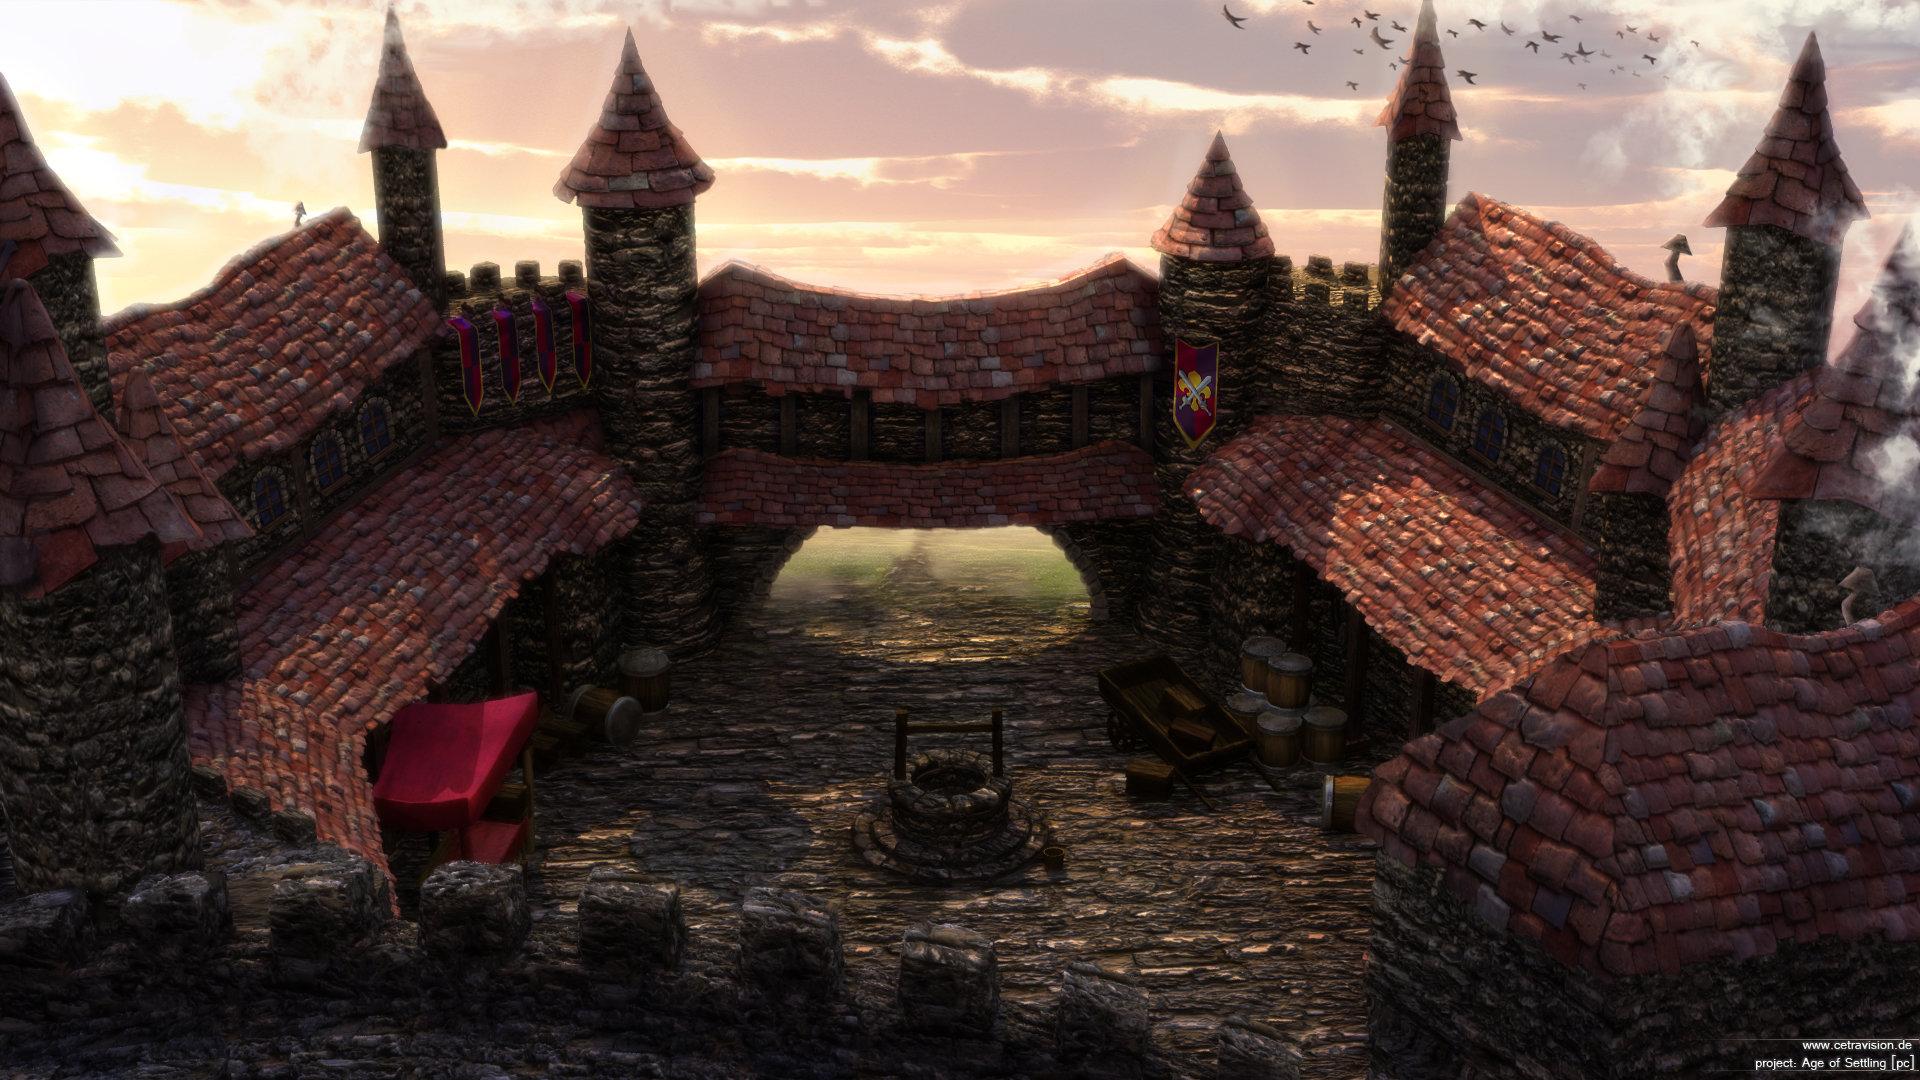 Carina schrom castle